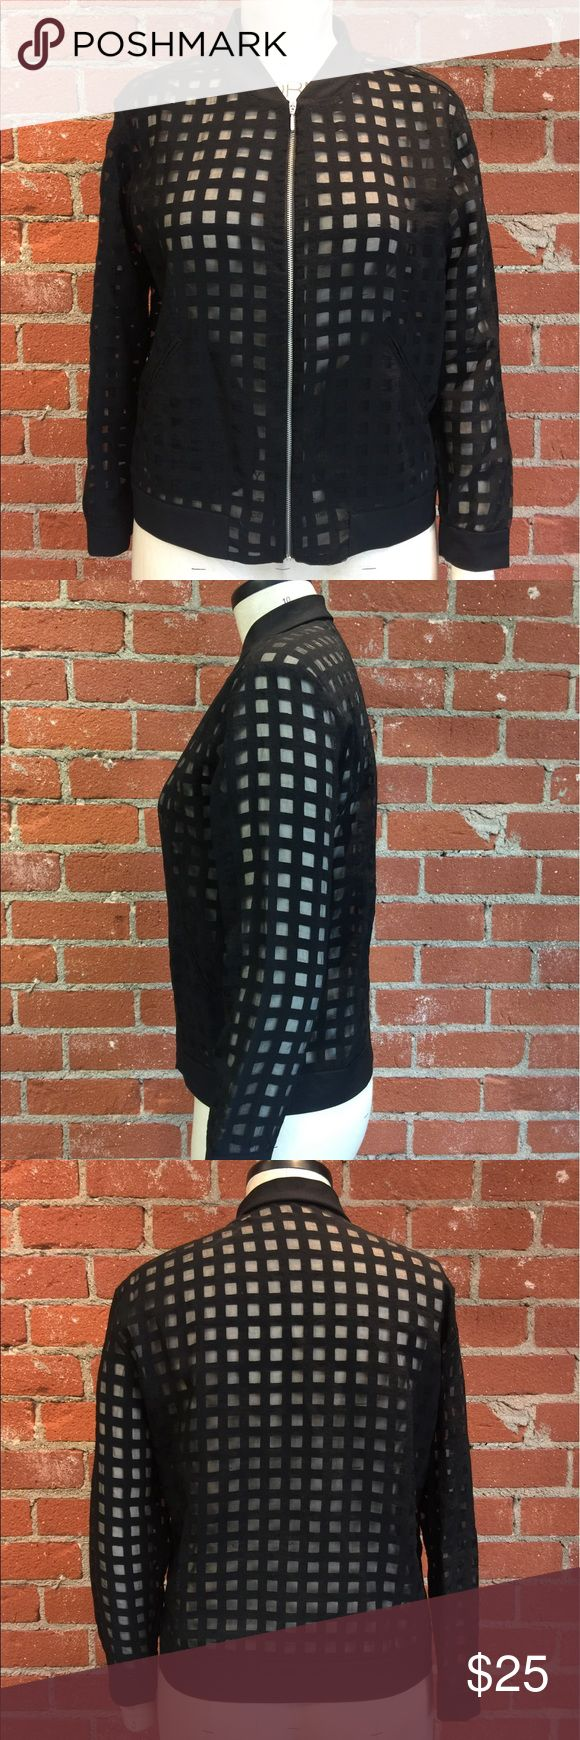 Zara sheer bomber jacket Zara sheer bomber jacket. Black